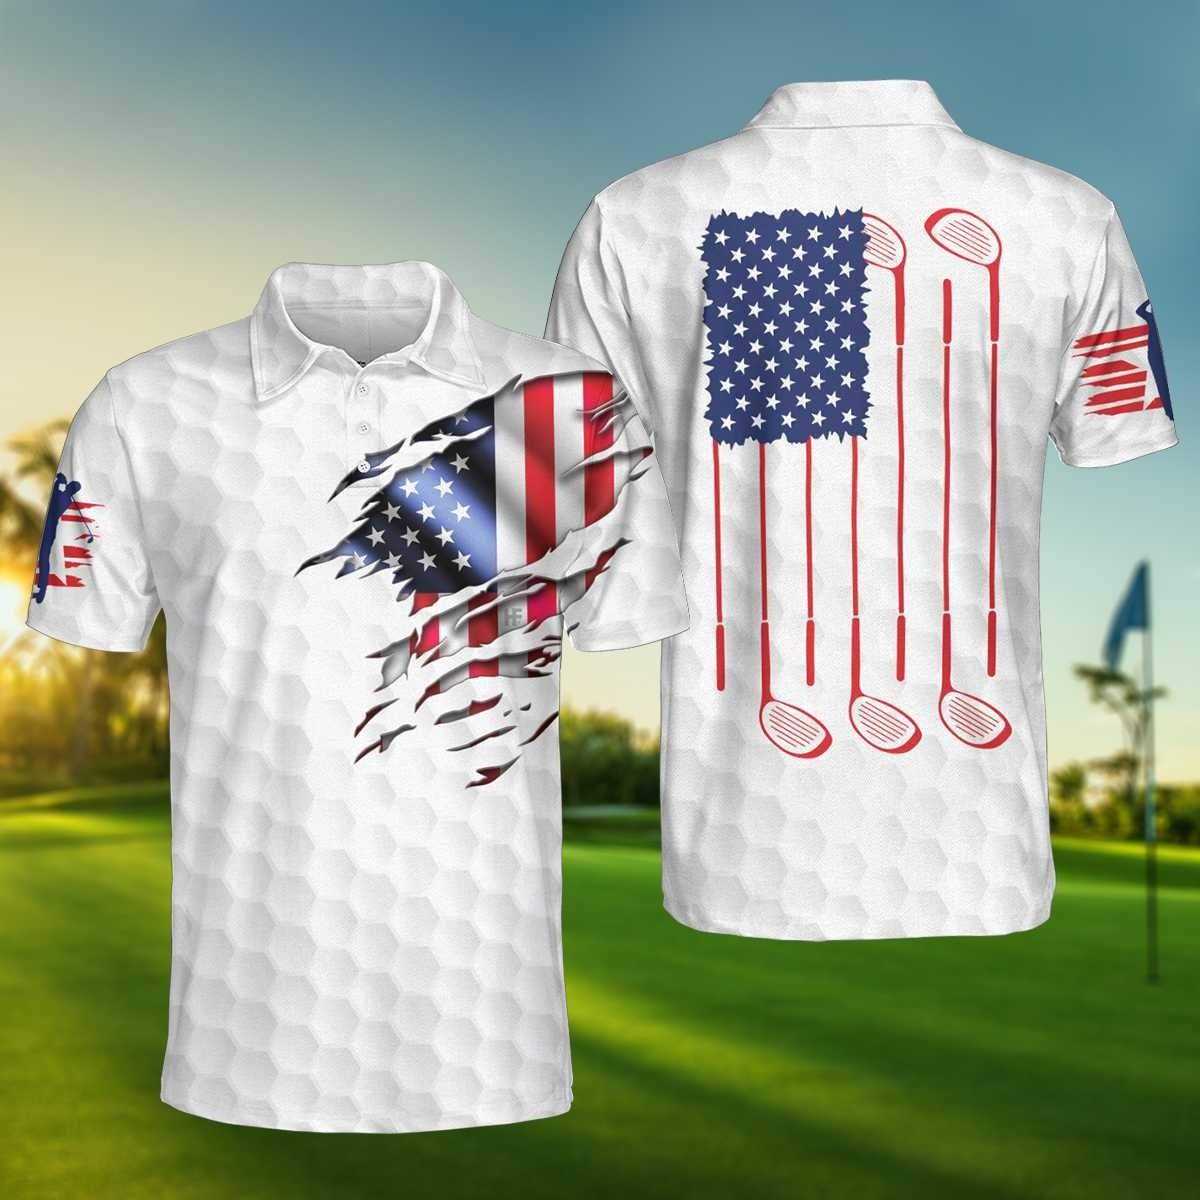 Golf American flag polo shirt2